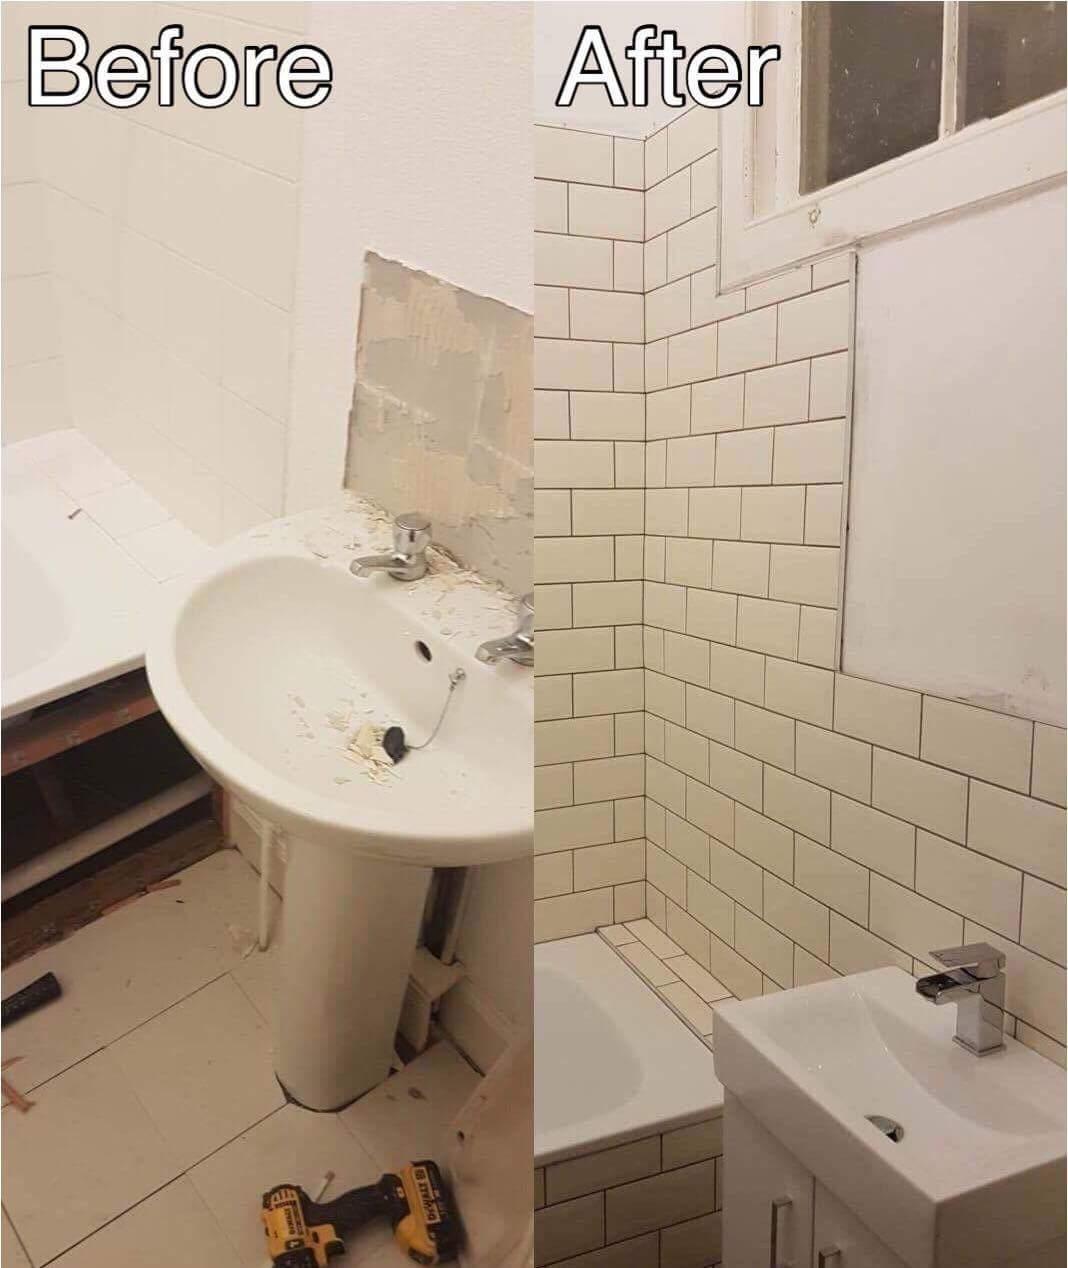 Indigo House Bathroom Installation And Fittings Edinburgh United Kingdom Tel 07845137